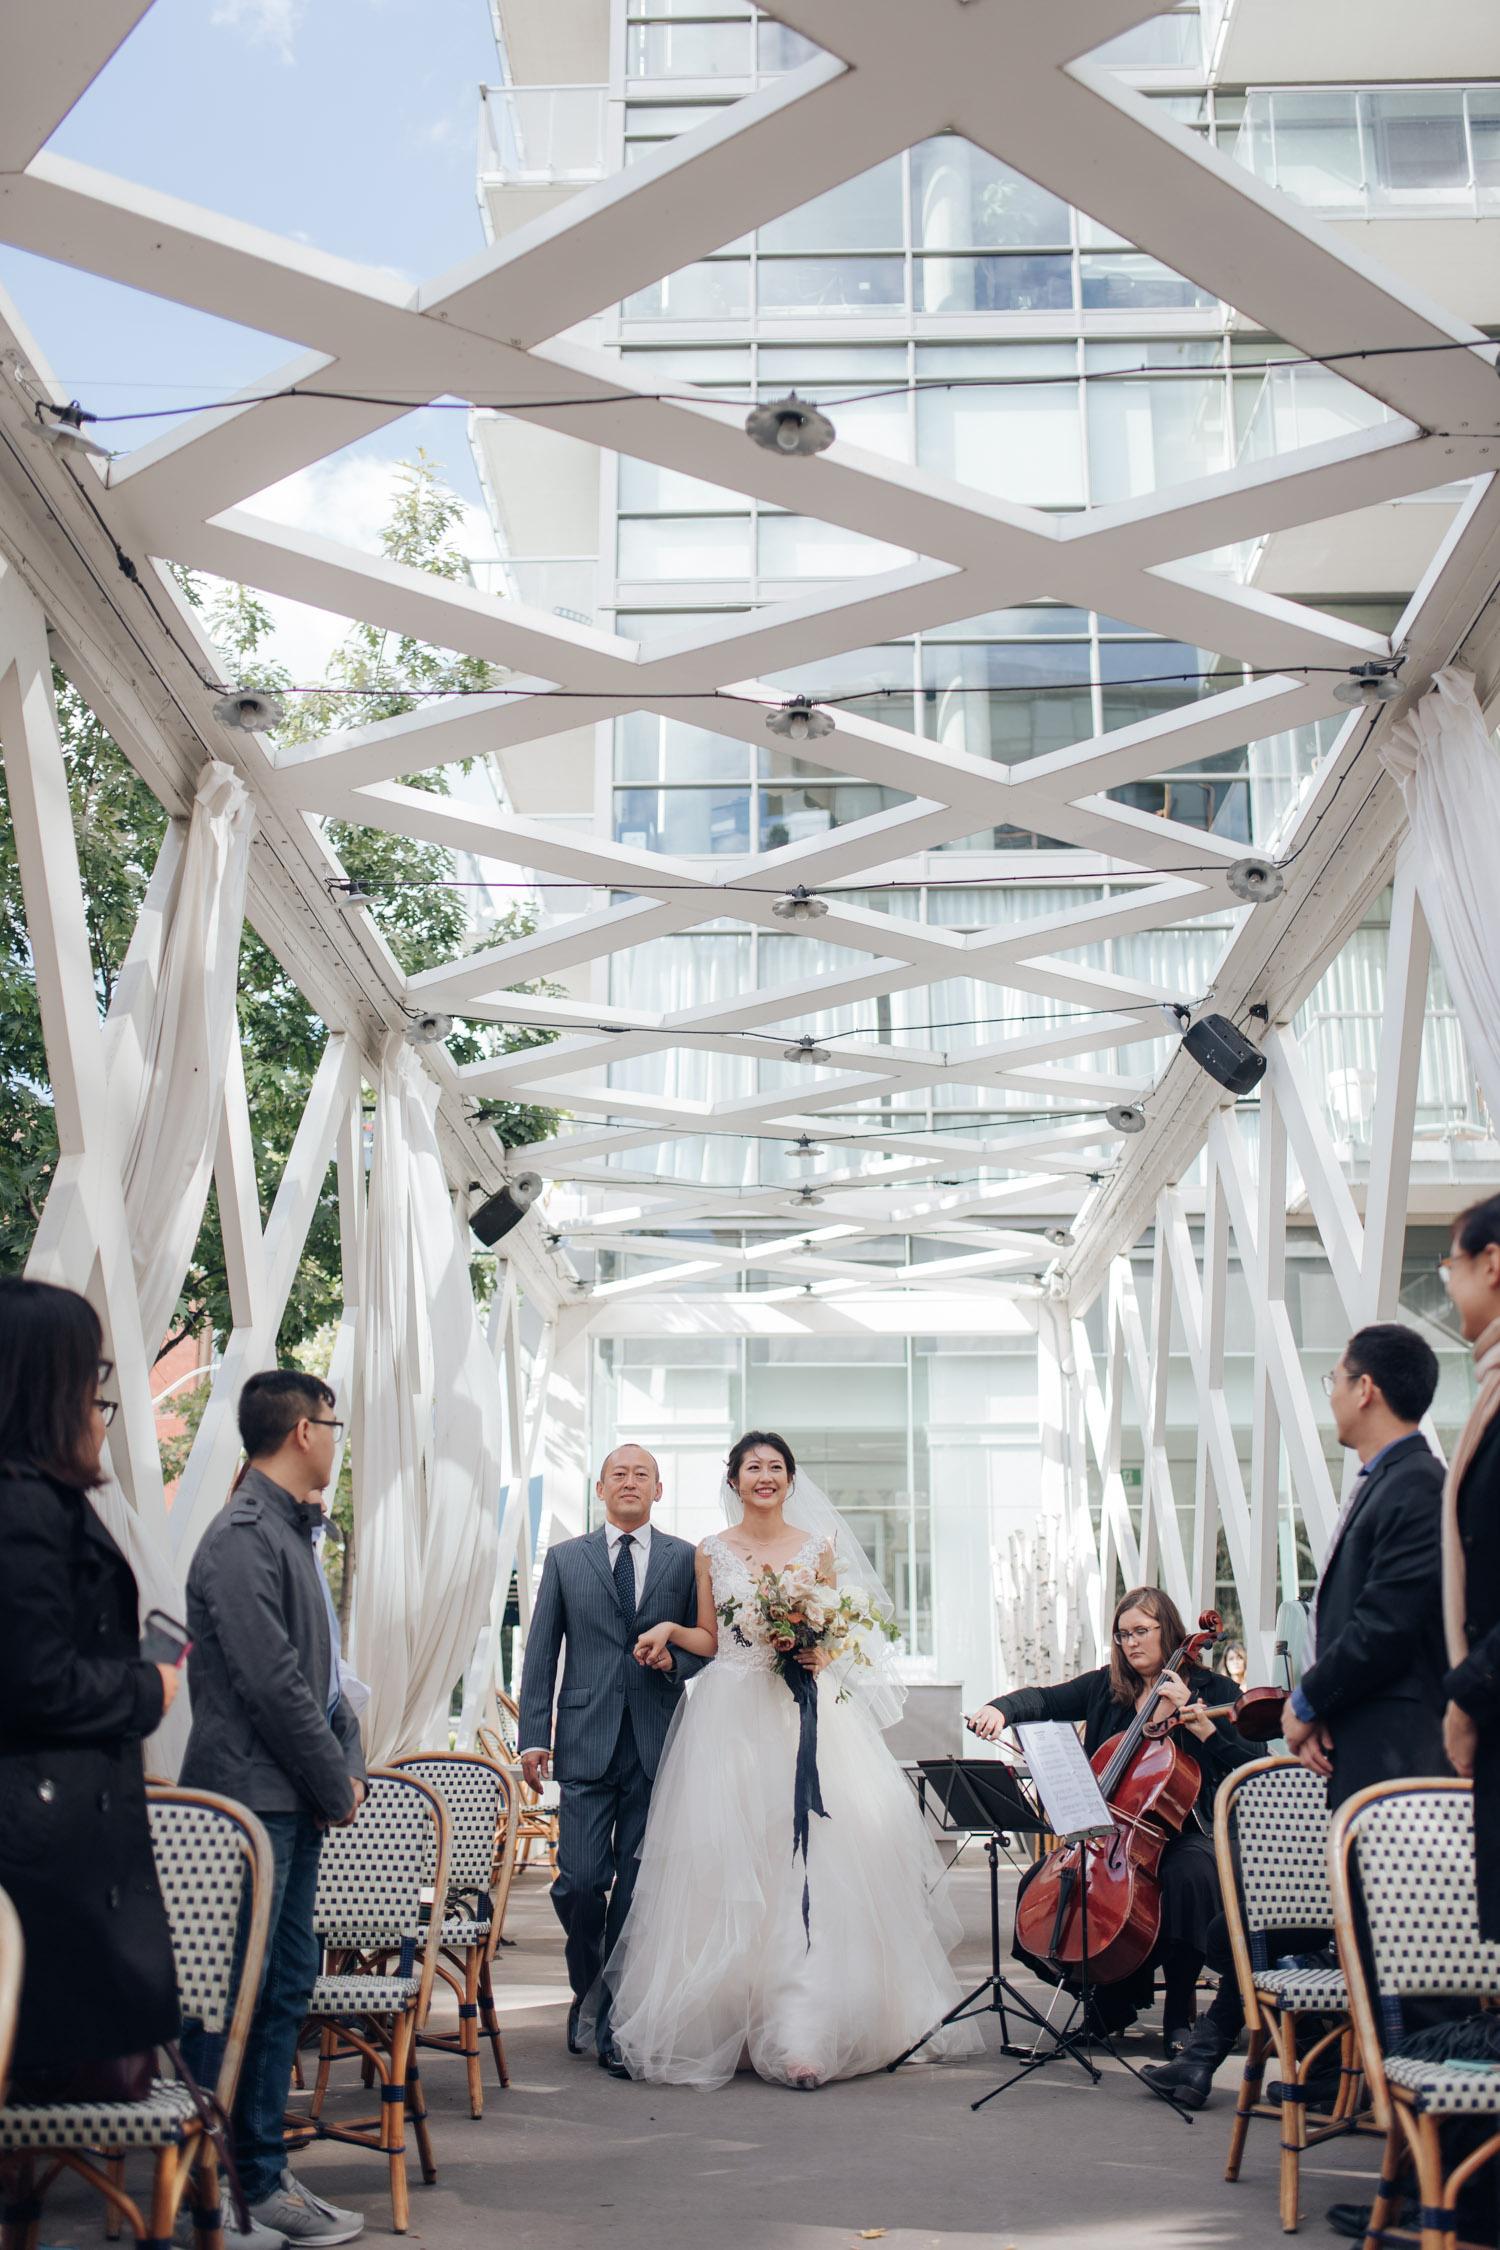 Toronto Colette grand cafe Wedding Ceremony Aile